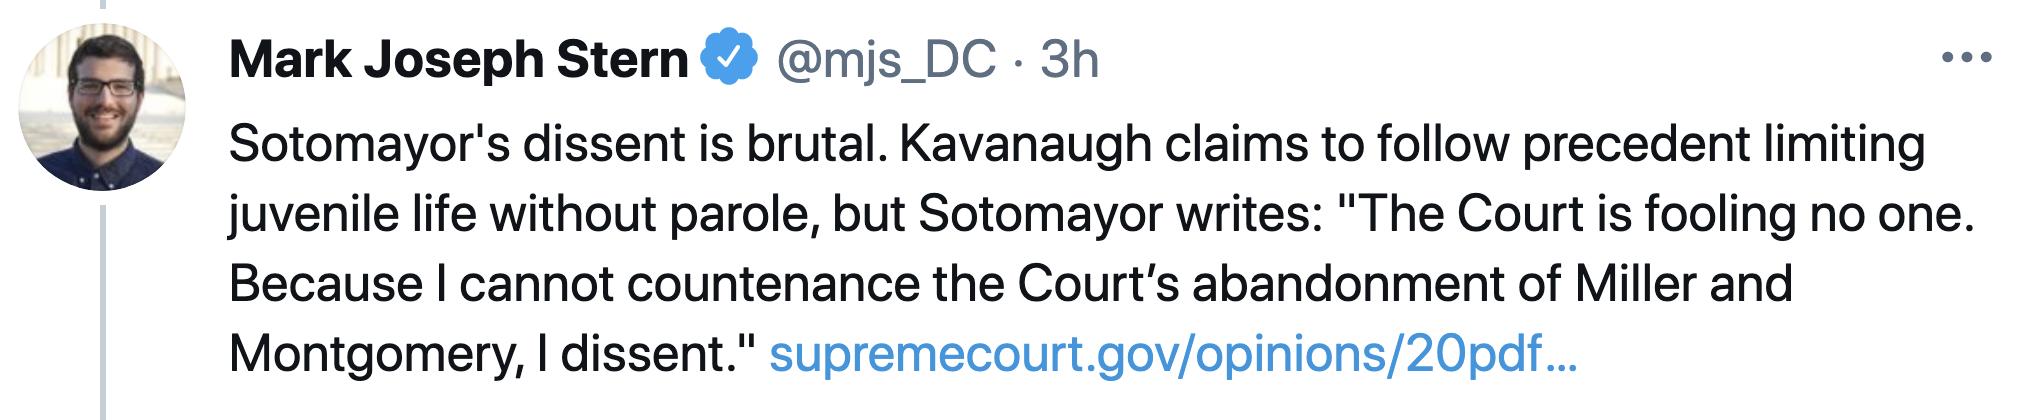 Screen-Shot-2021-04-22-at-12.51.51-PM Sonia Sotomayor Steamrolls Over Brett Kavanaugh In Thursday Rebuke Child Abuse Featured Politics Supreme Court Top Stories